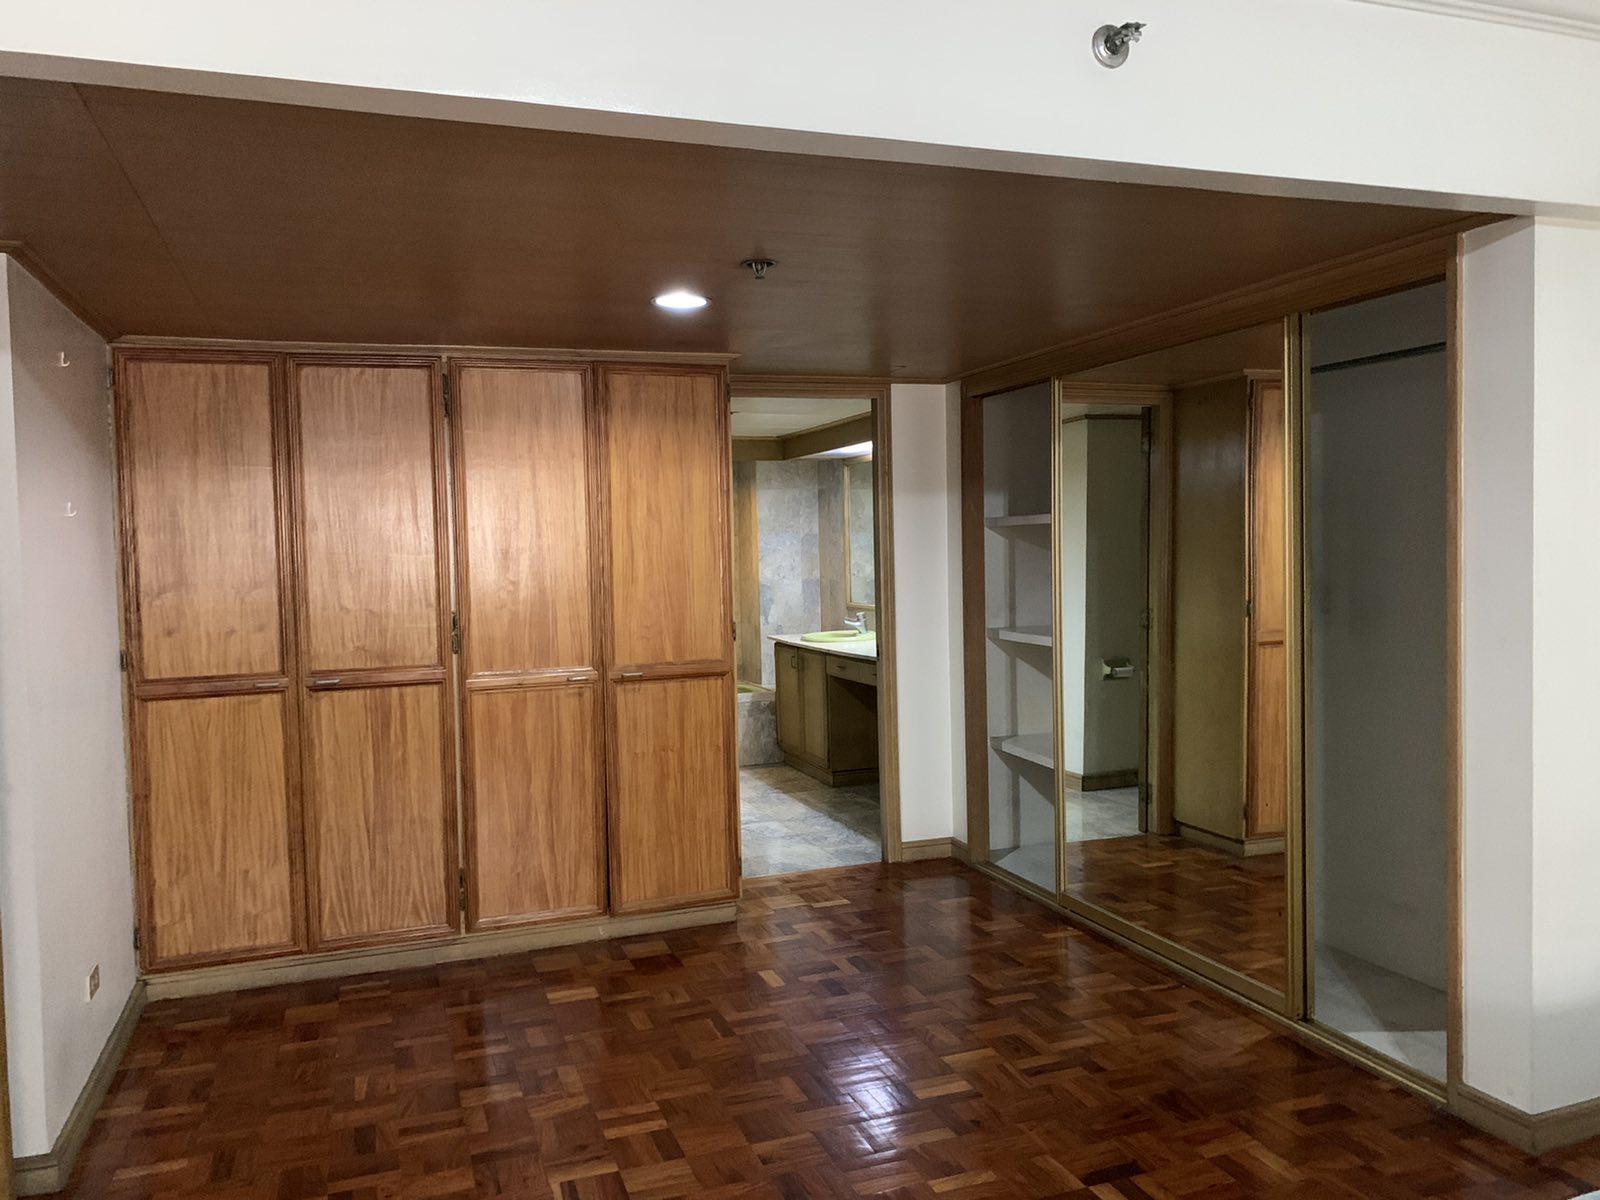 3BR Condominium in Makati City for Rent